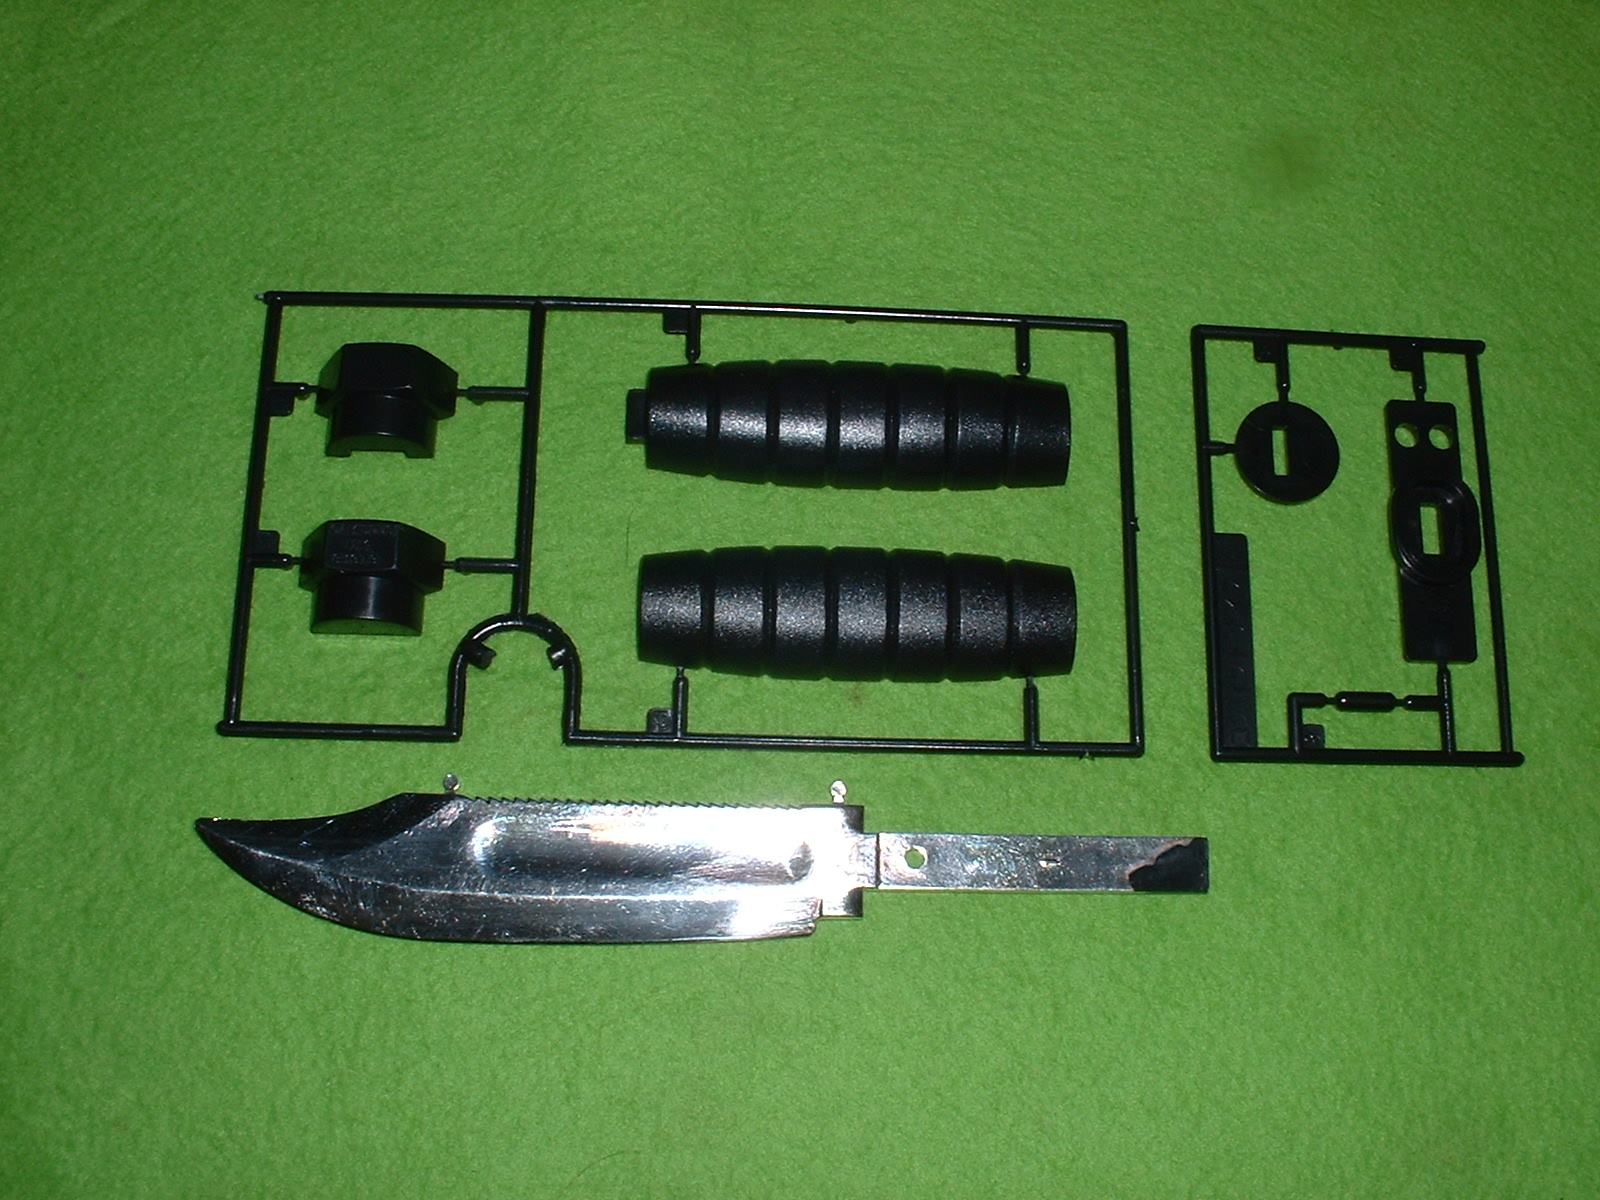 LS(現 マイクロエース)  『U.S.コンバットナイフ』未組み立て部品構成 Doburoku-TAO.JPG